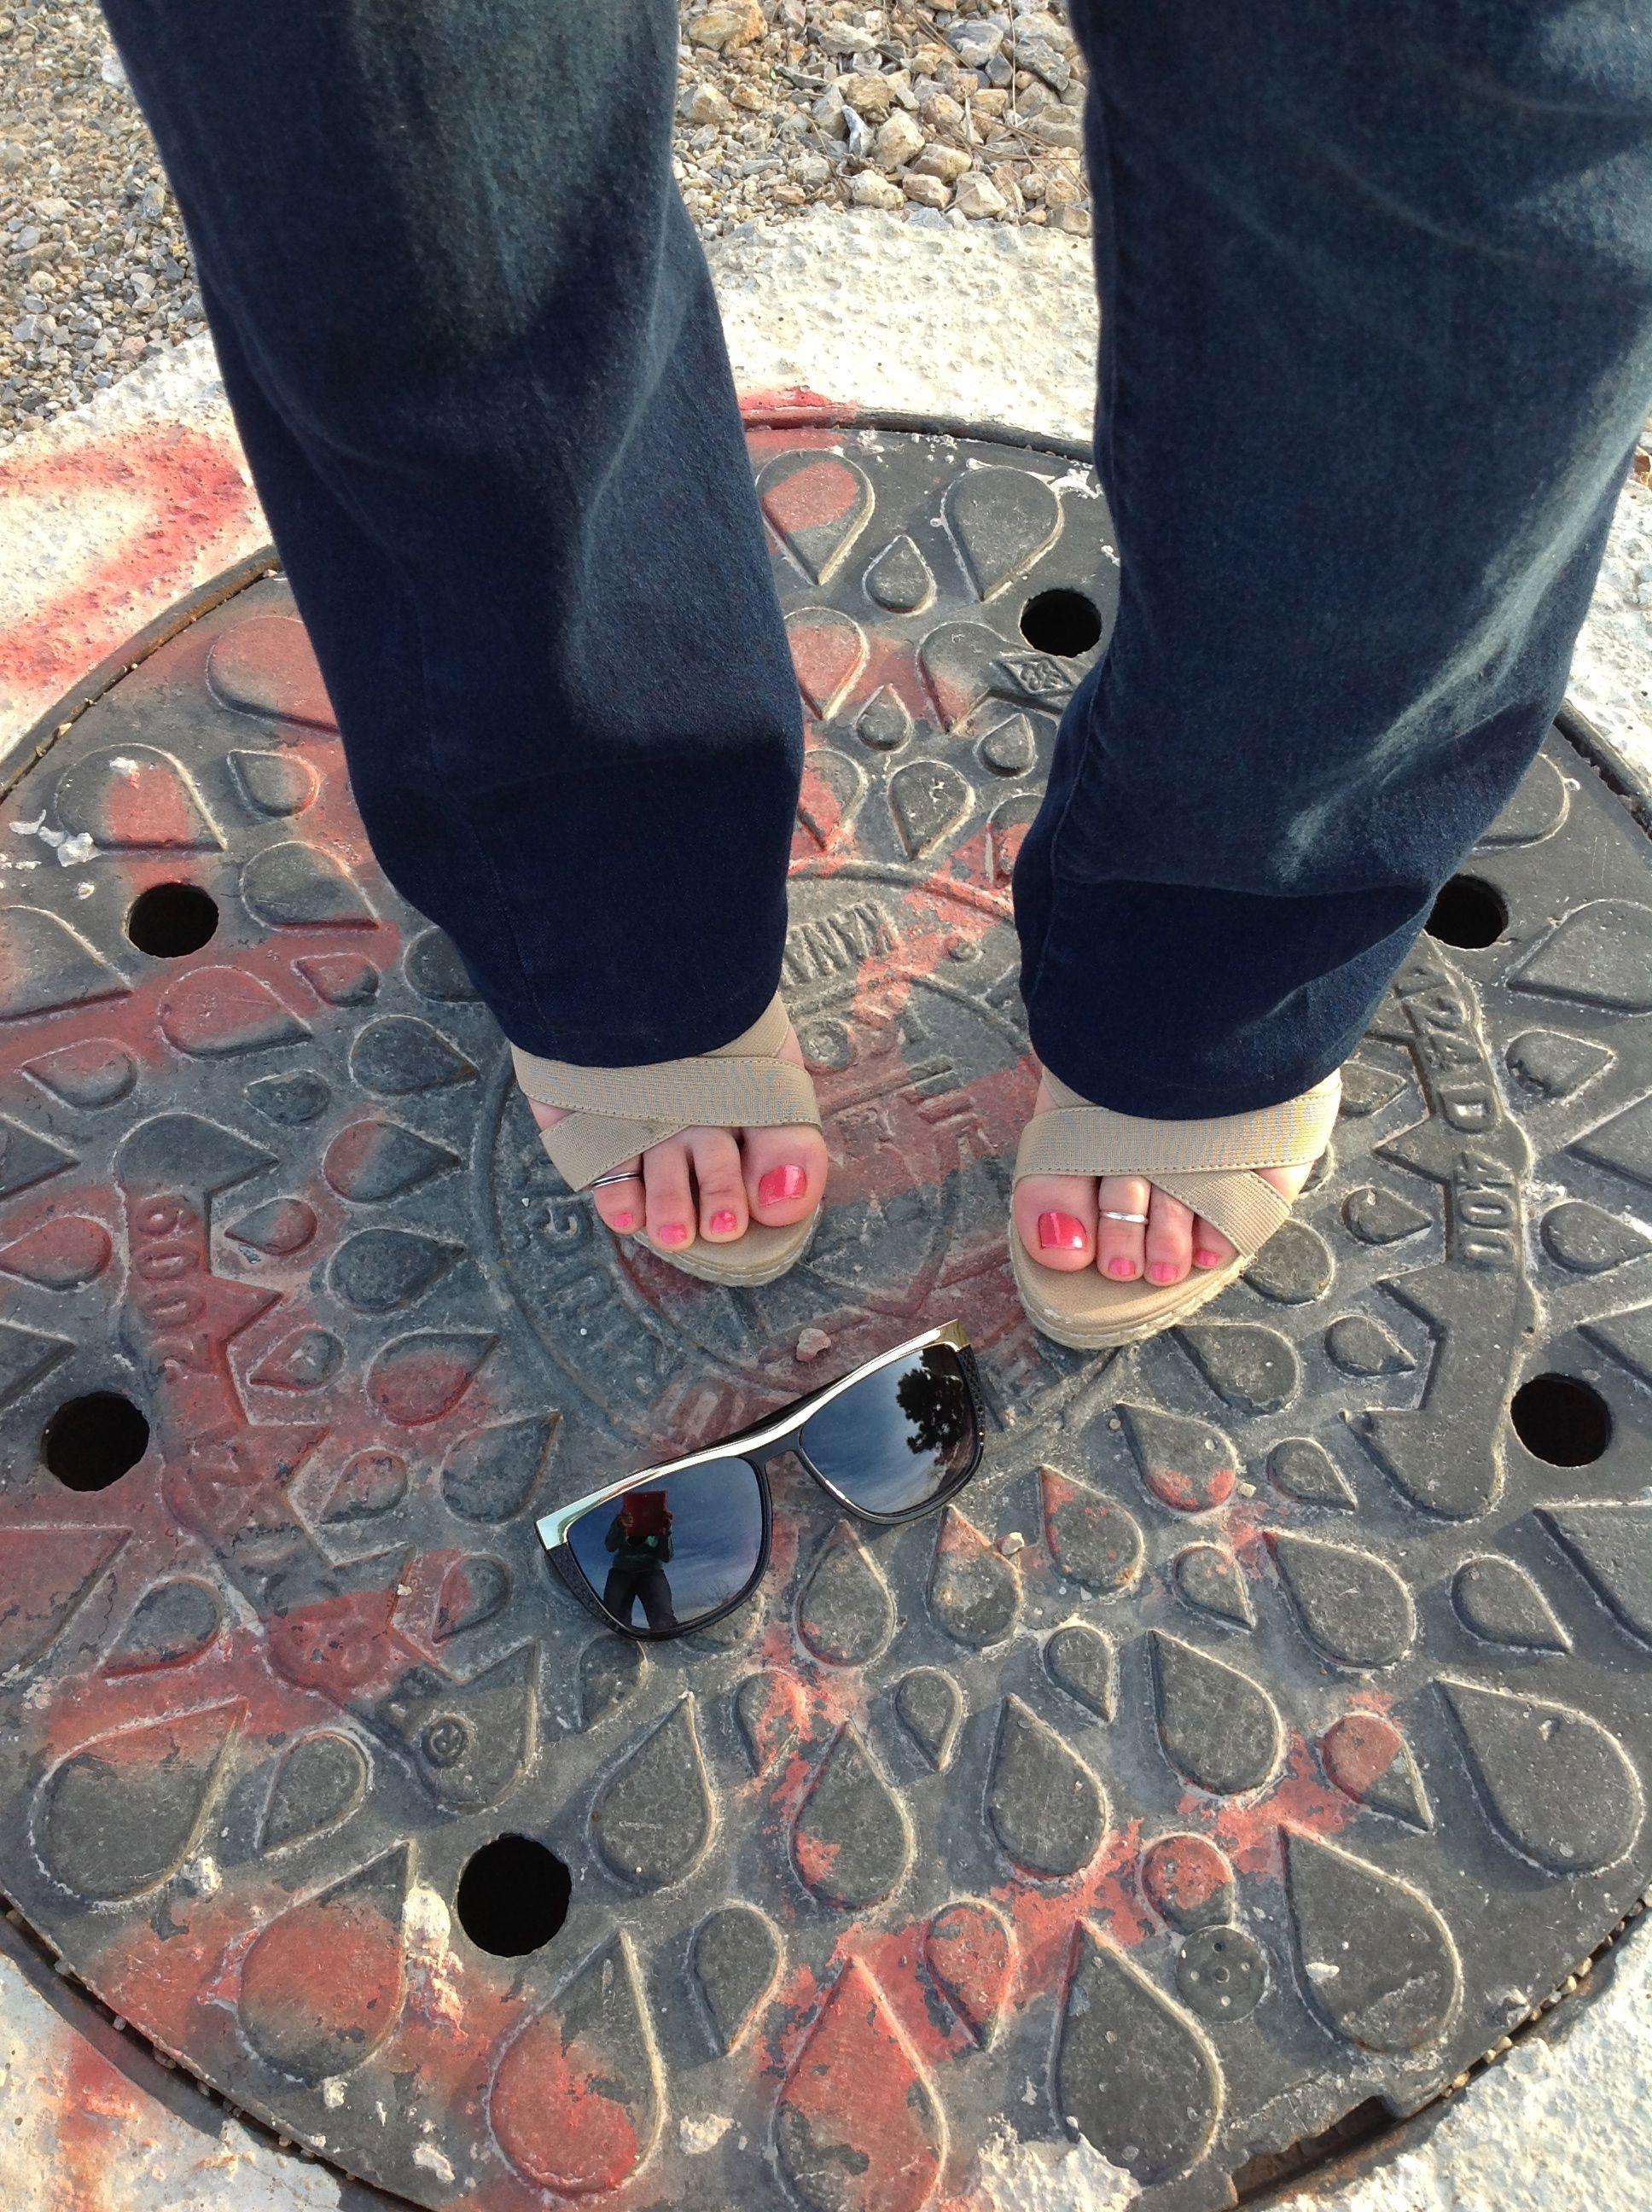 NordstromRack shoes Koton sunnies www